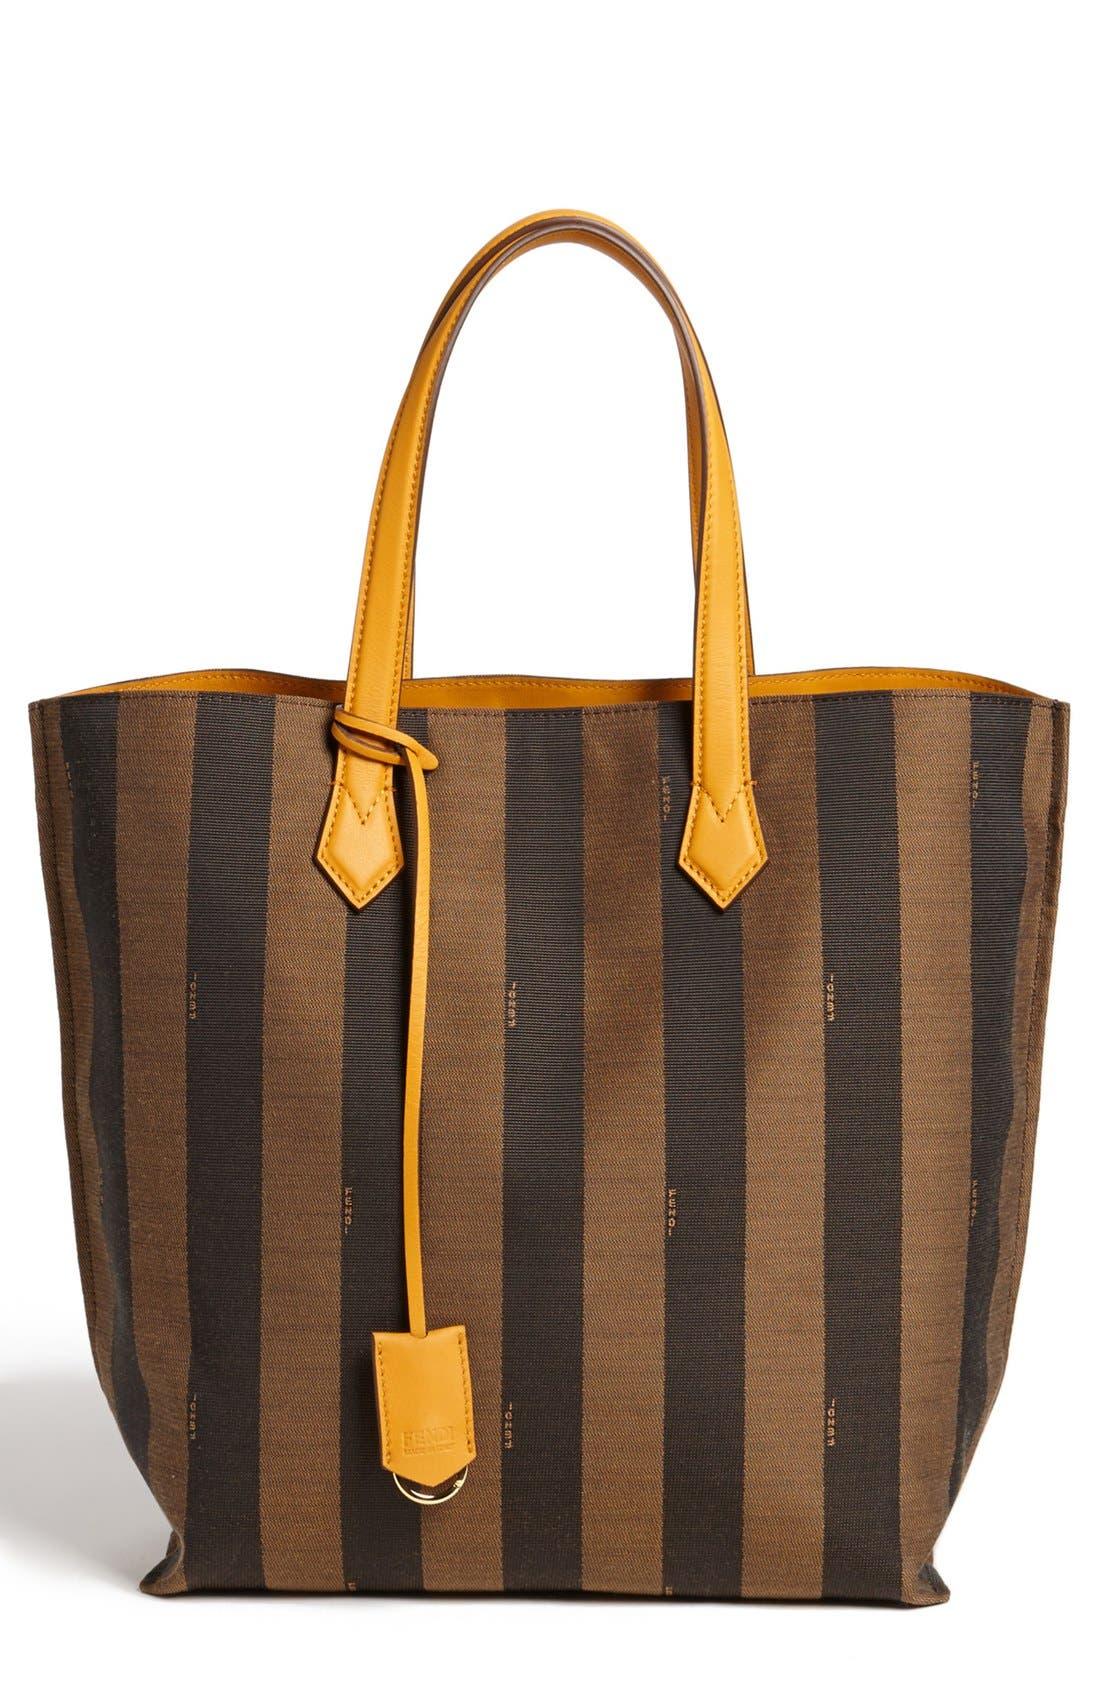 Alternate Image 1 Selected - Fendi 'All In - Pequin' Logo Jacquard Shopper Tote